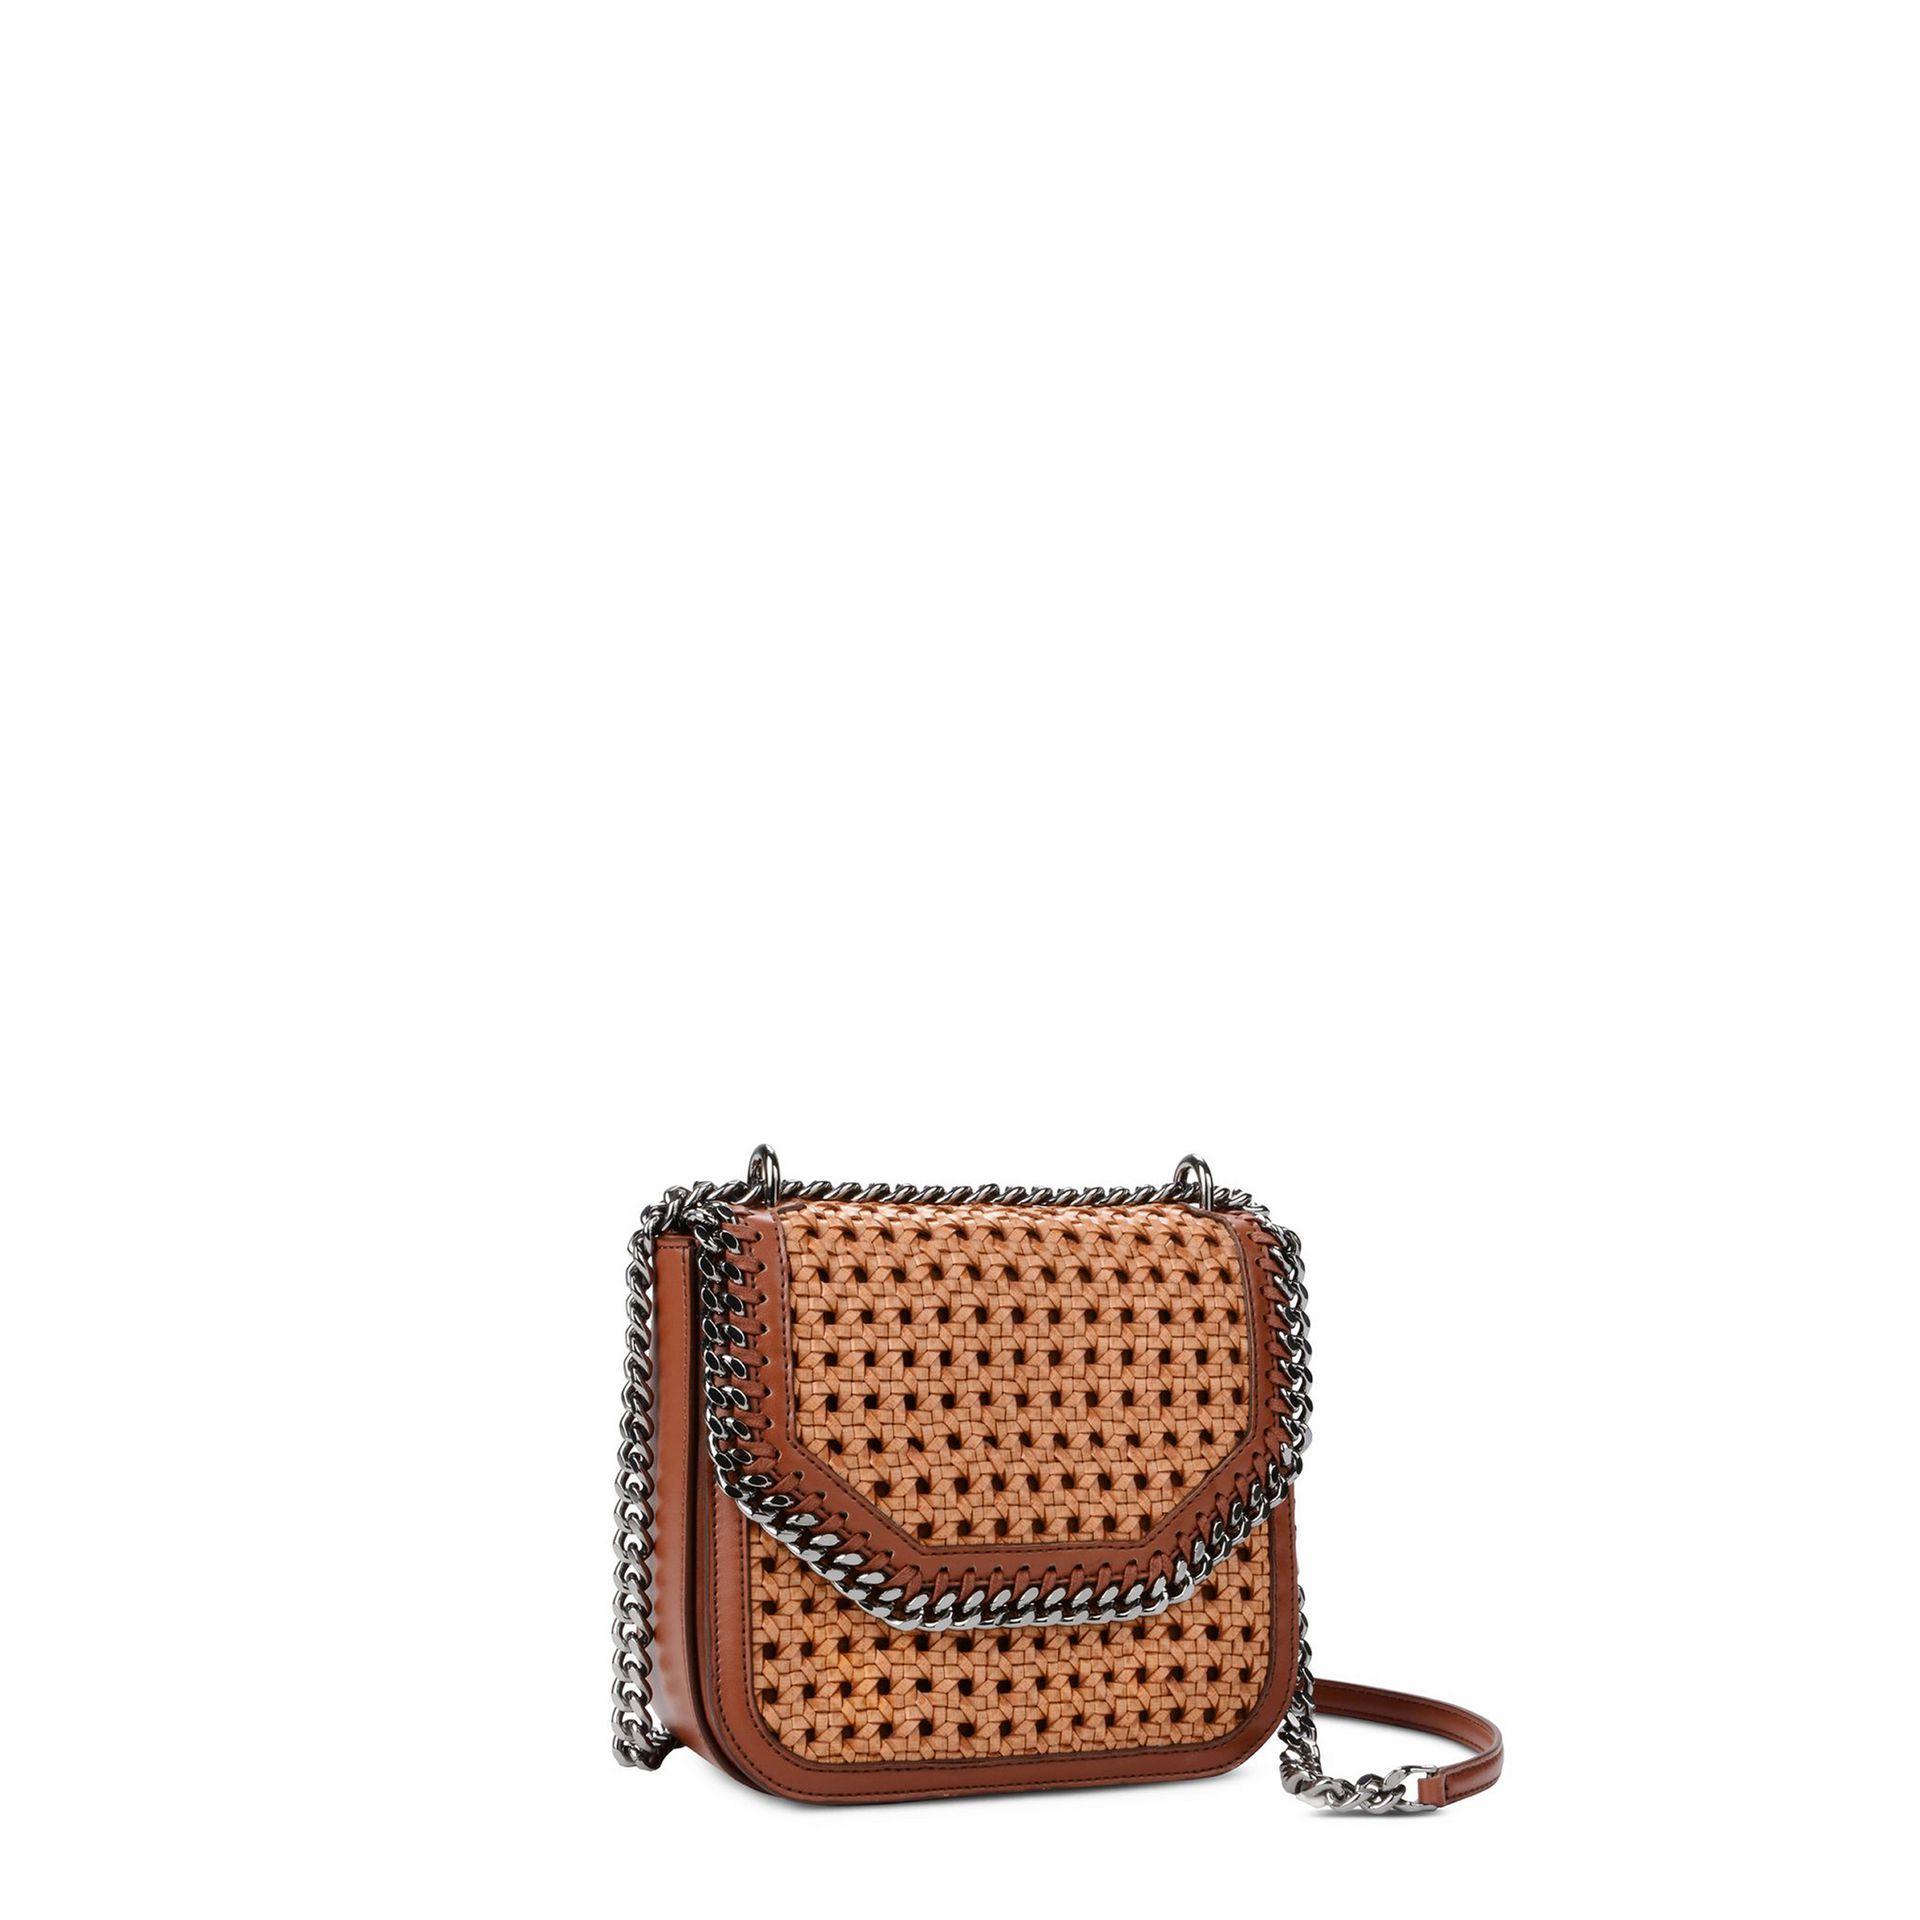 4c1722bba252 Tan Falabella Box wicker Medium Shoulder Bag - STELLA MCCARTNEY ...